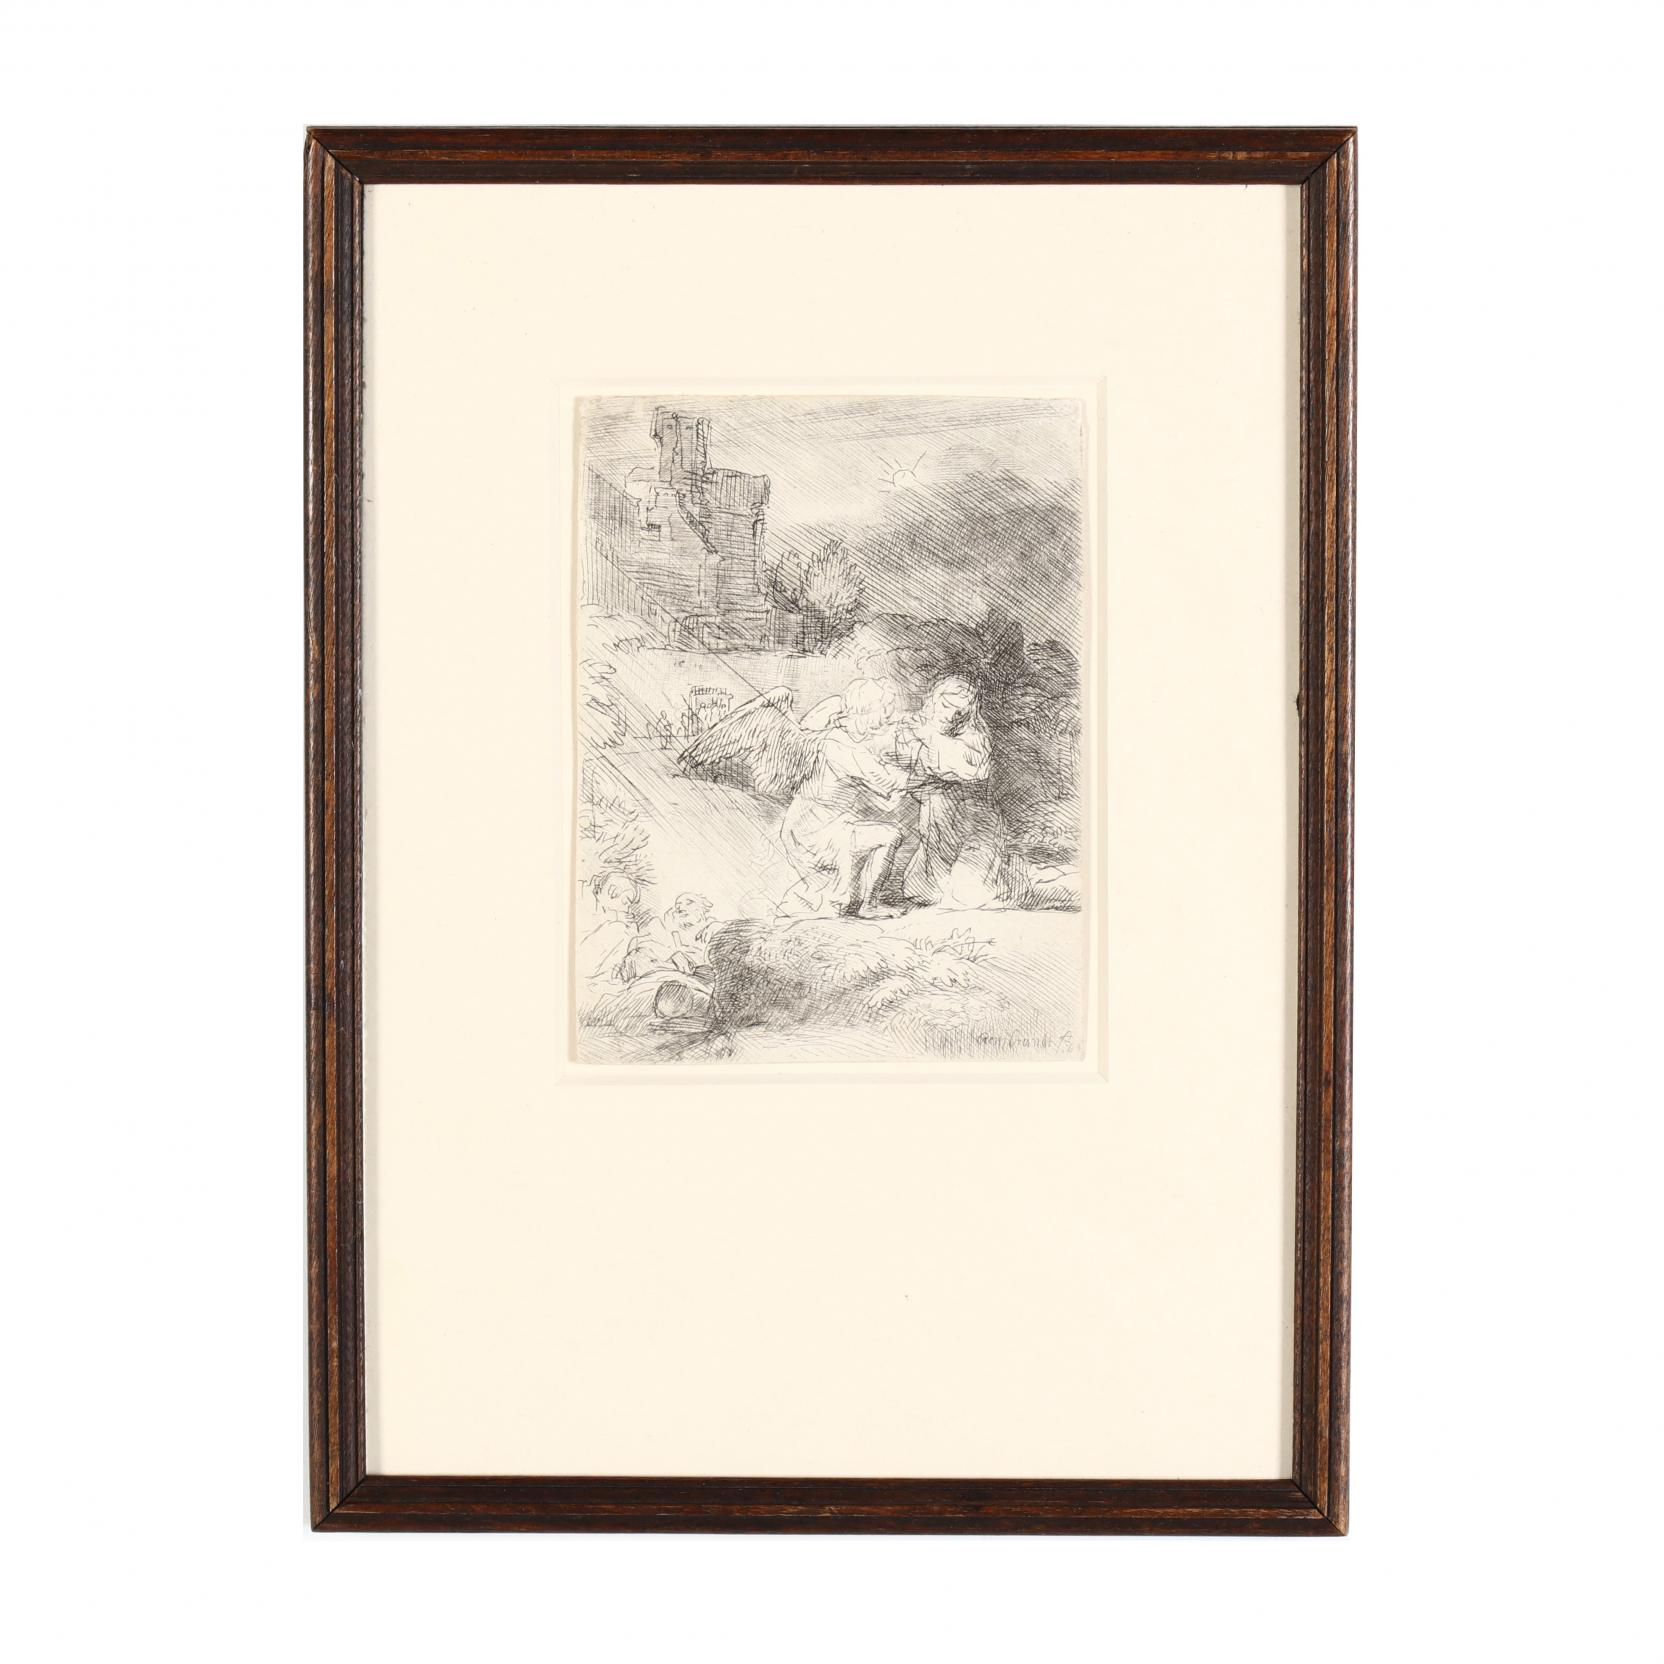 rembrandt-van-rijn-dutch-1606-1669-i-agony-in-the-garden-i